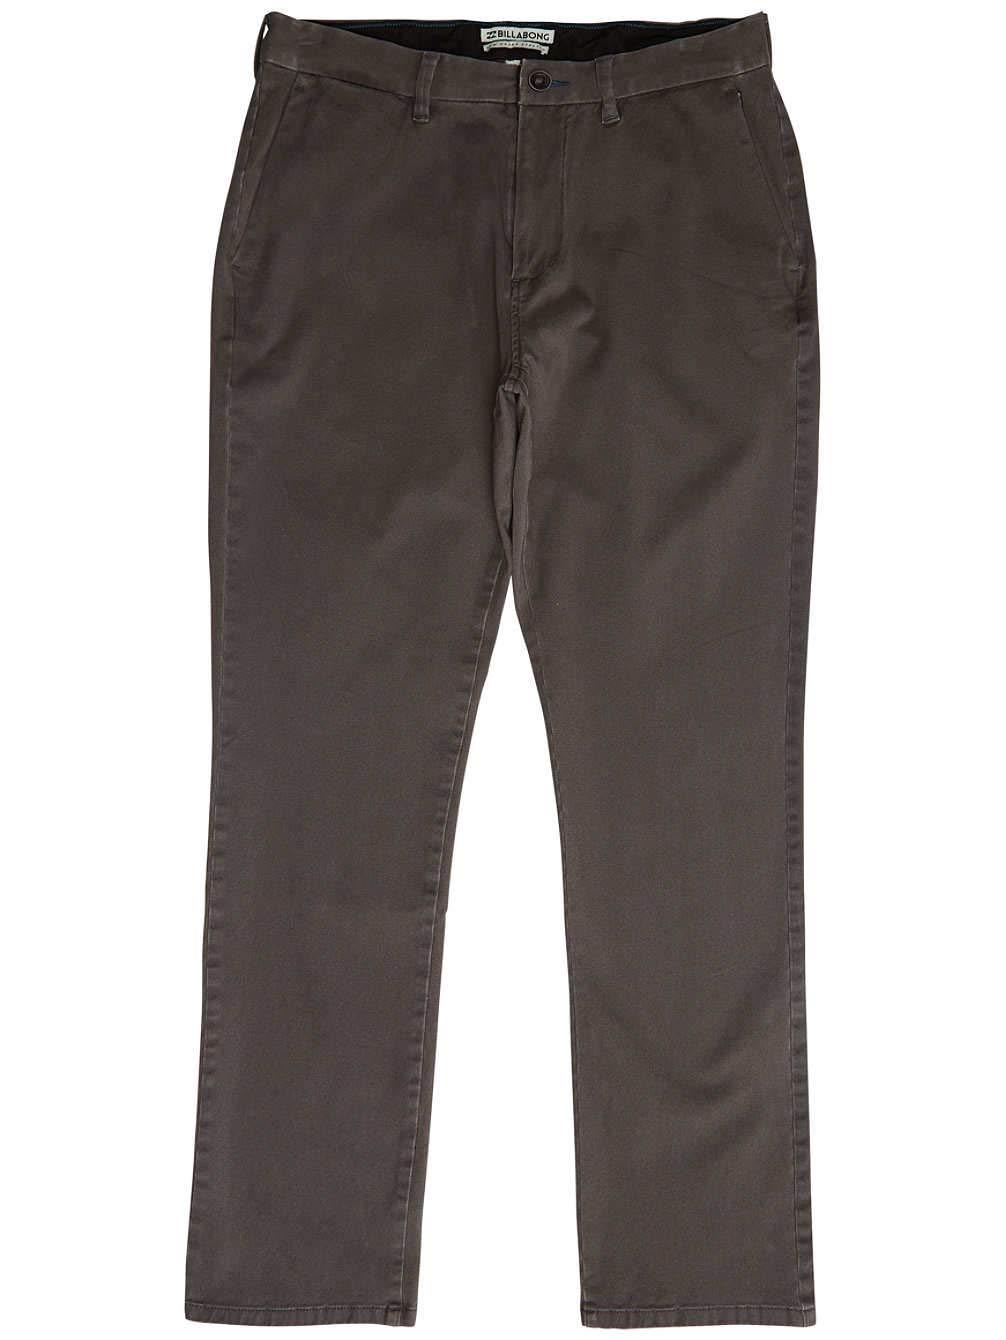 BILLABONG New Order Chino Pantalones, Hombre, Gris (Raven 1358), (Tamaño del Fabricante:33)